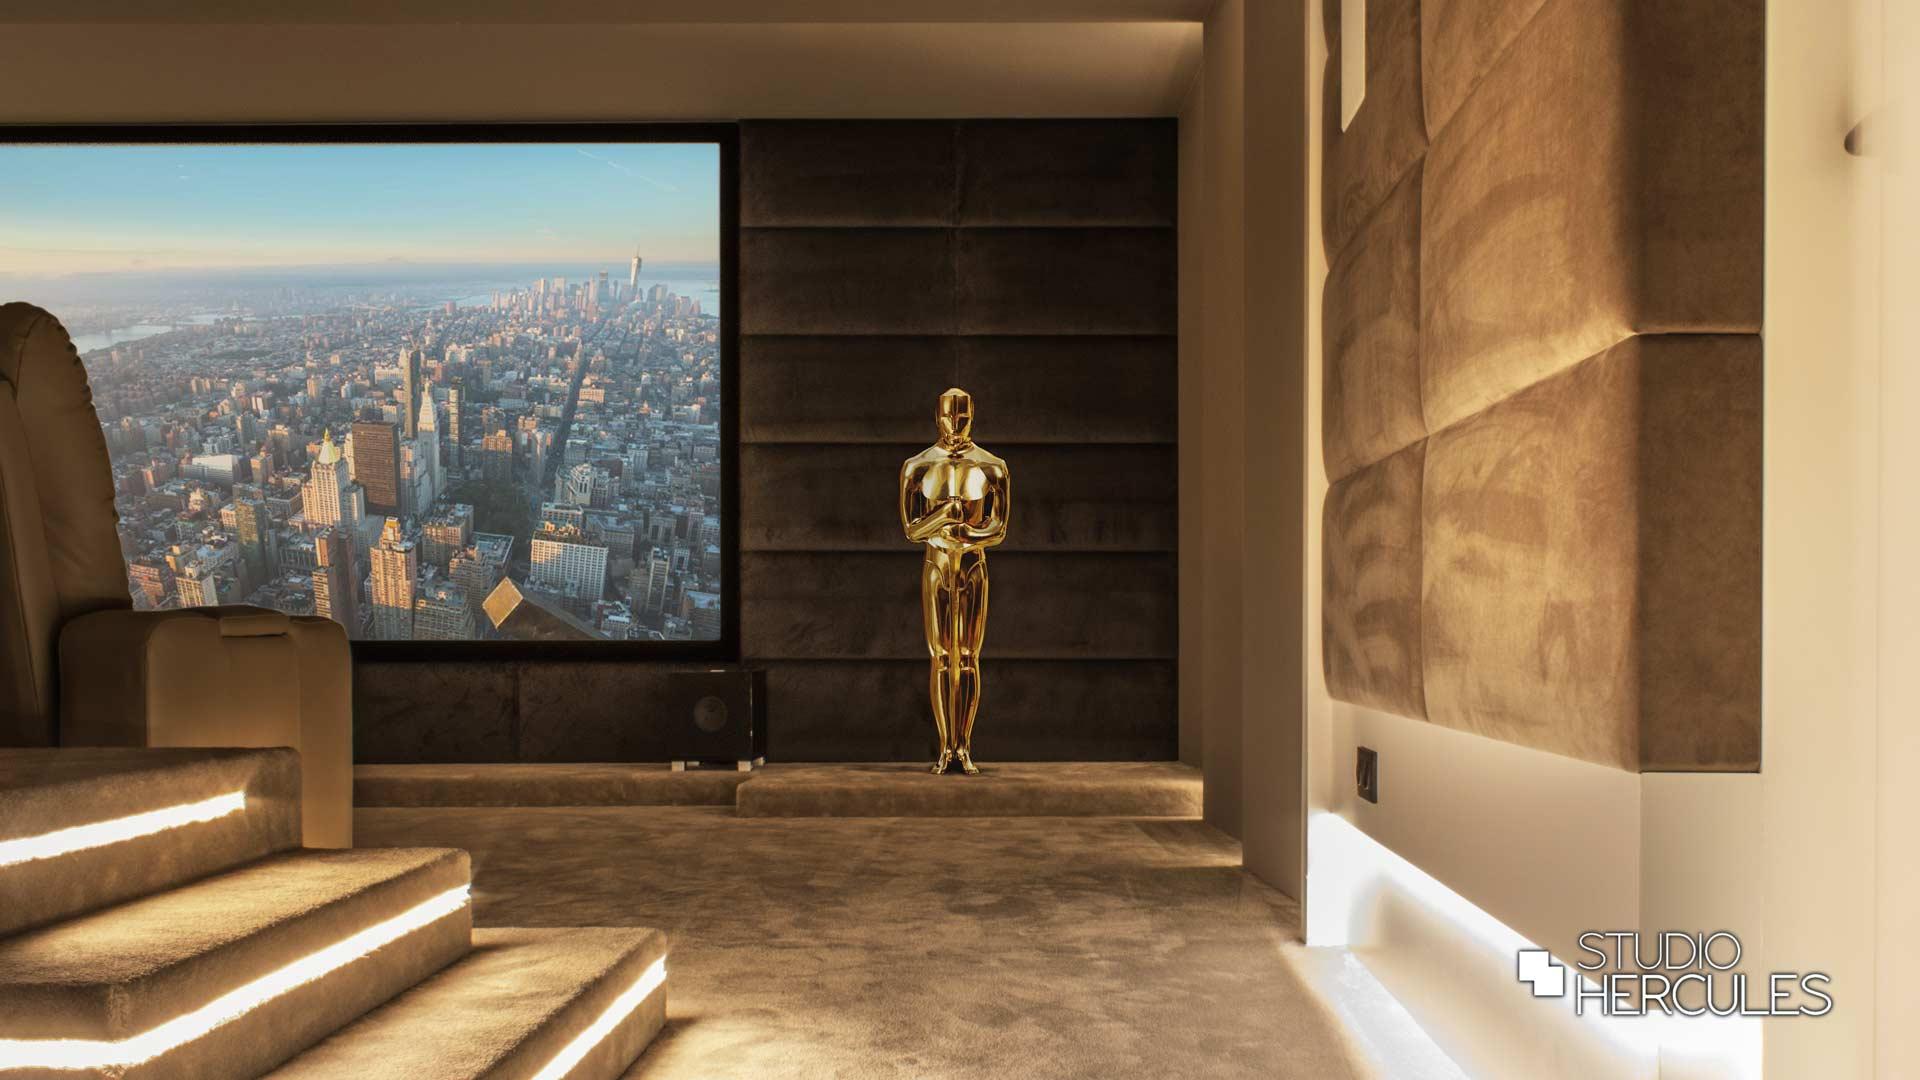 Oscar op tapijt podium ledstrips geintegreerd in wand en plafond